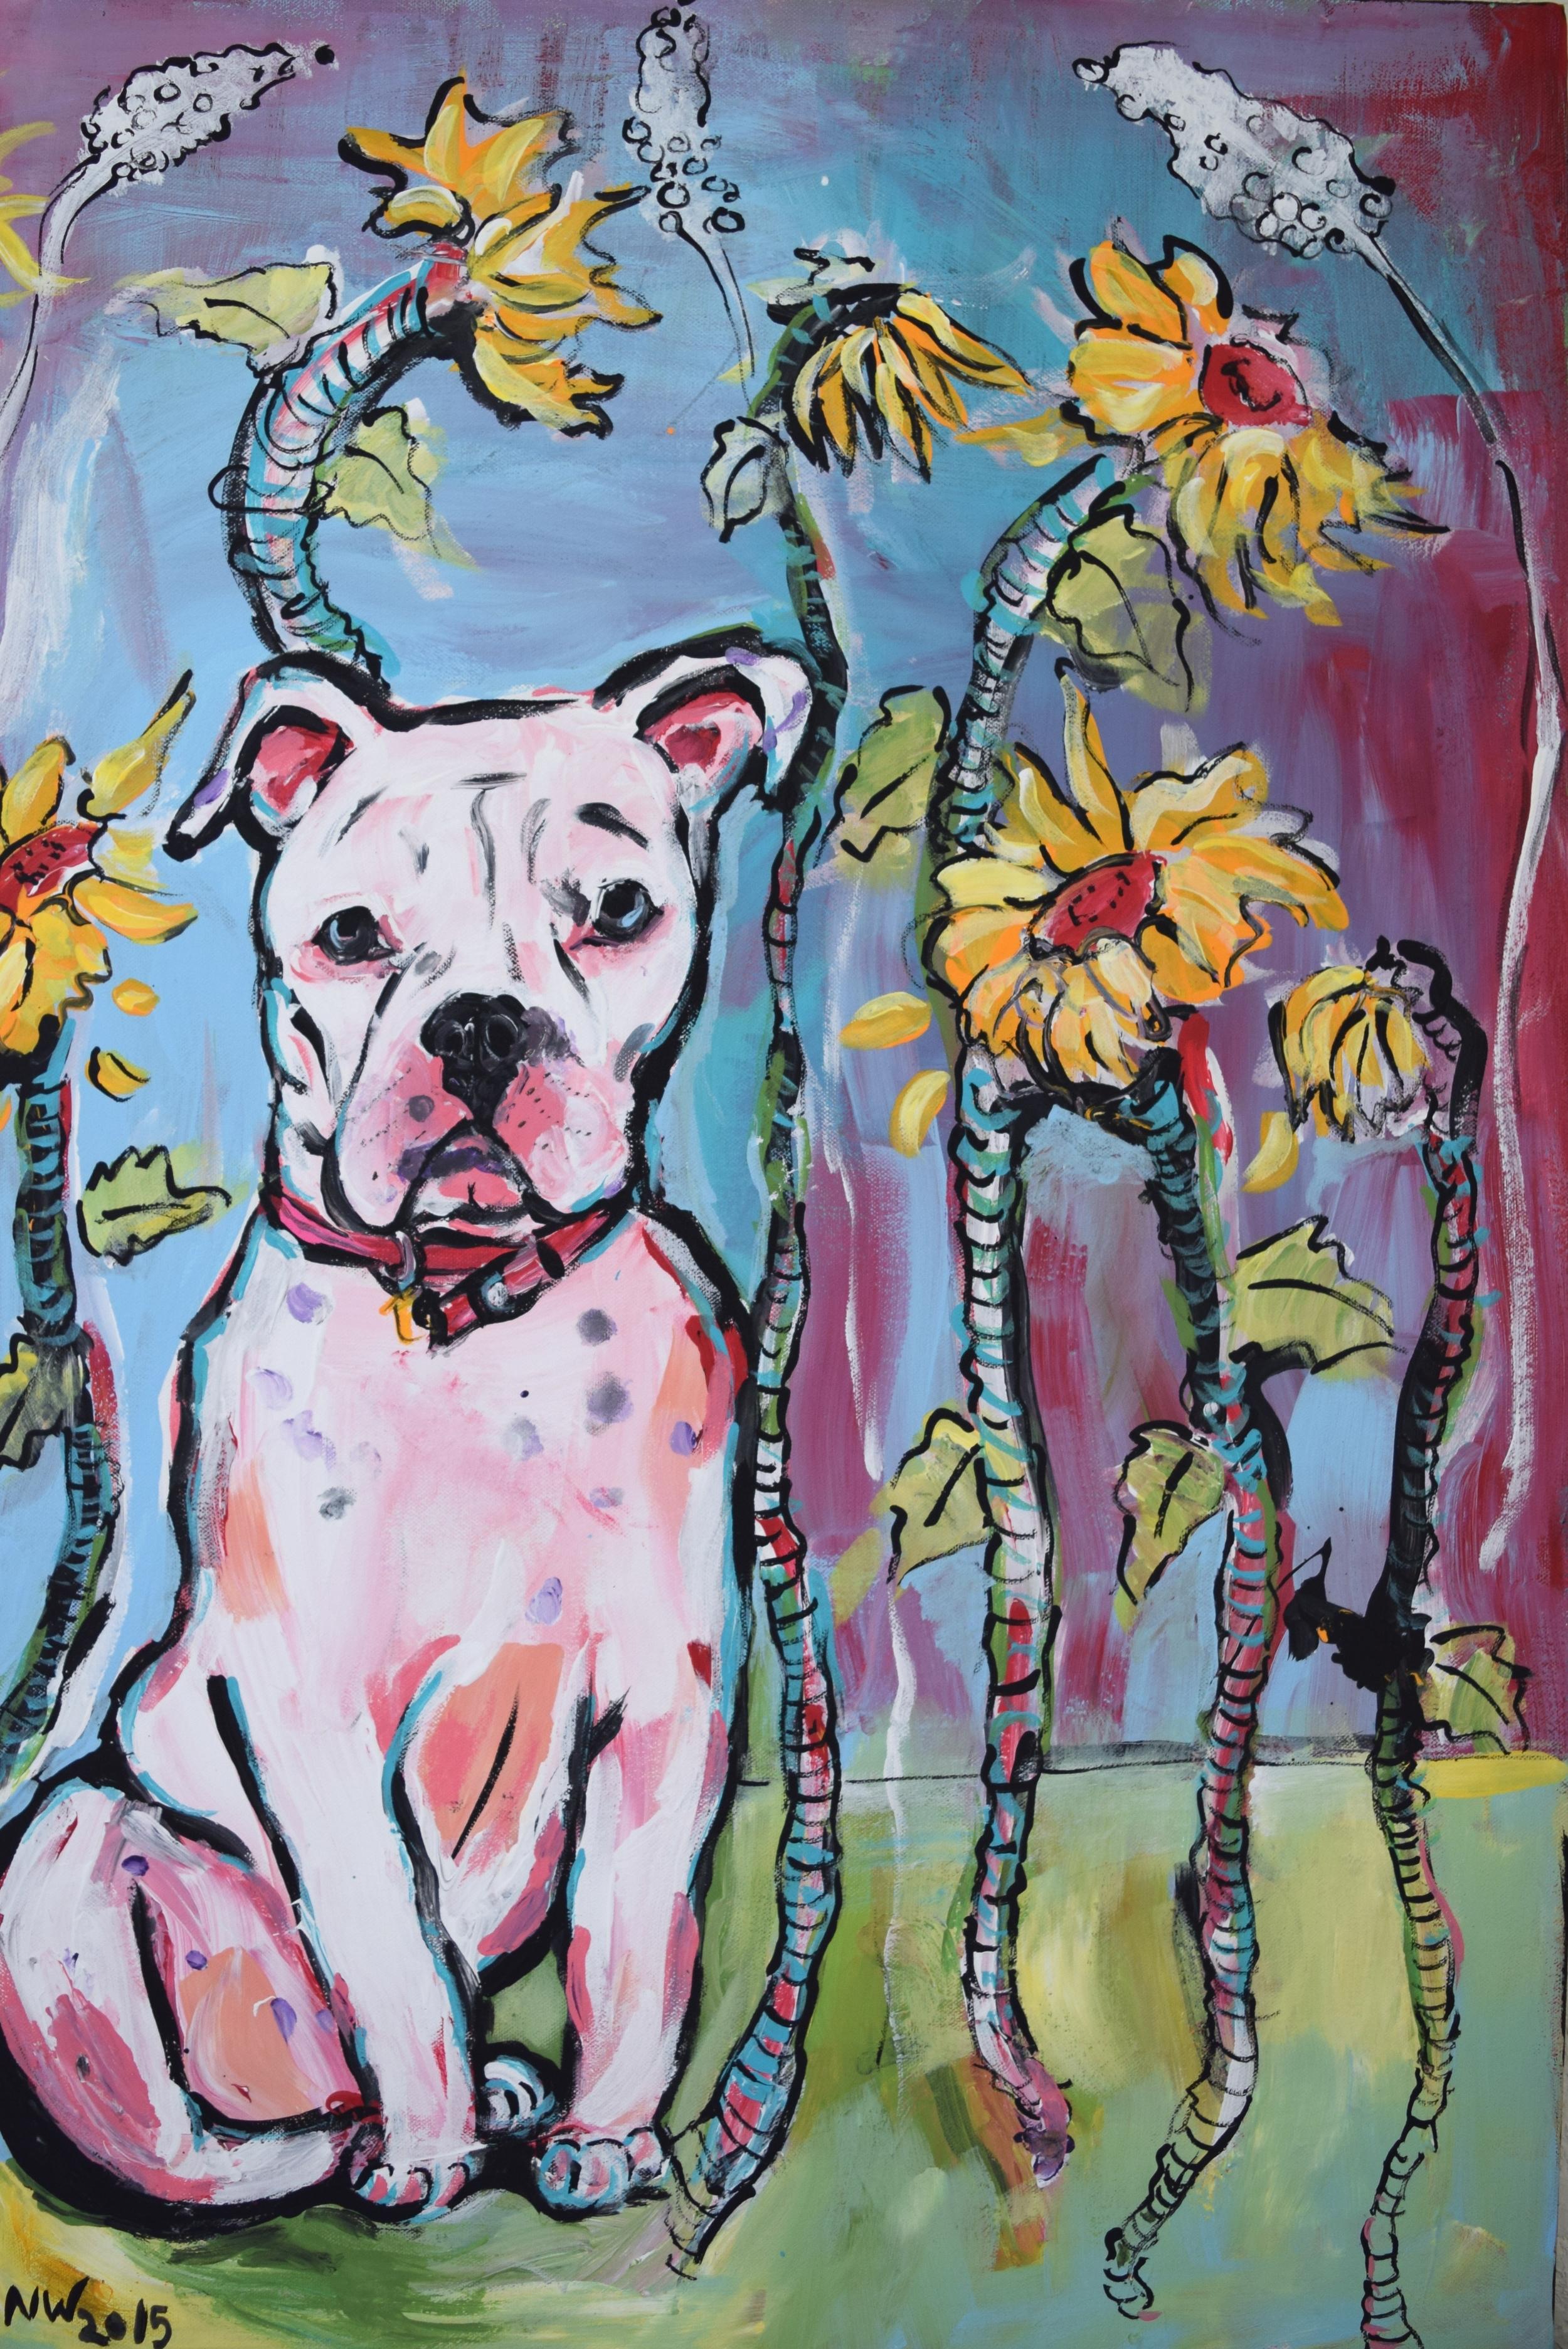 "Libby/ Acrylic on Canvas/ 24x36"" /January 2015 (SOLD)"